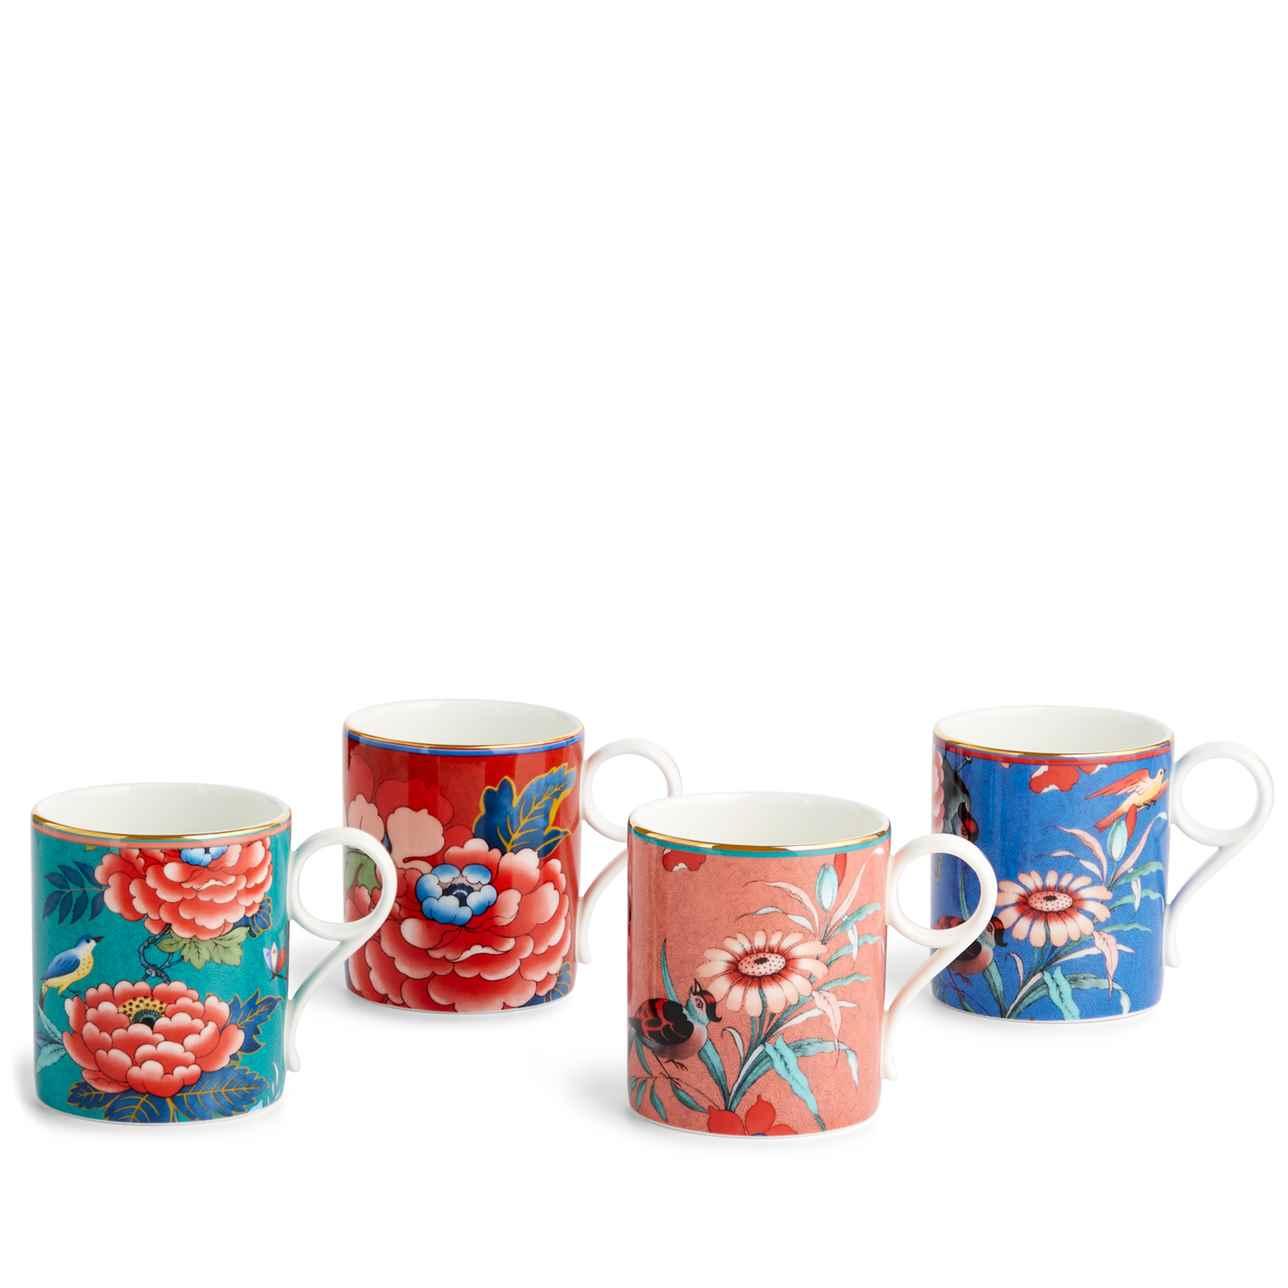 Paeonia Blush Small Mug, Set of 4